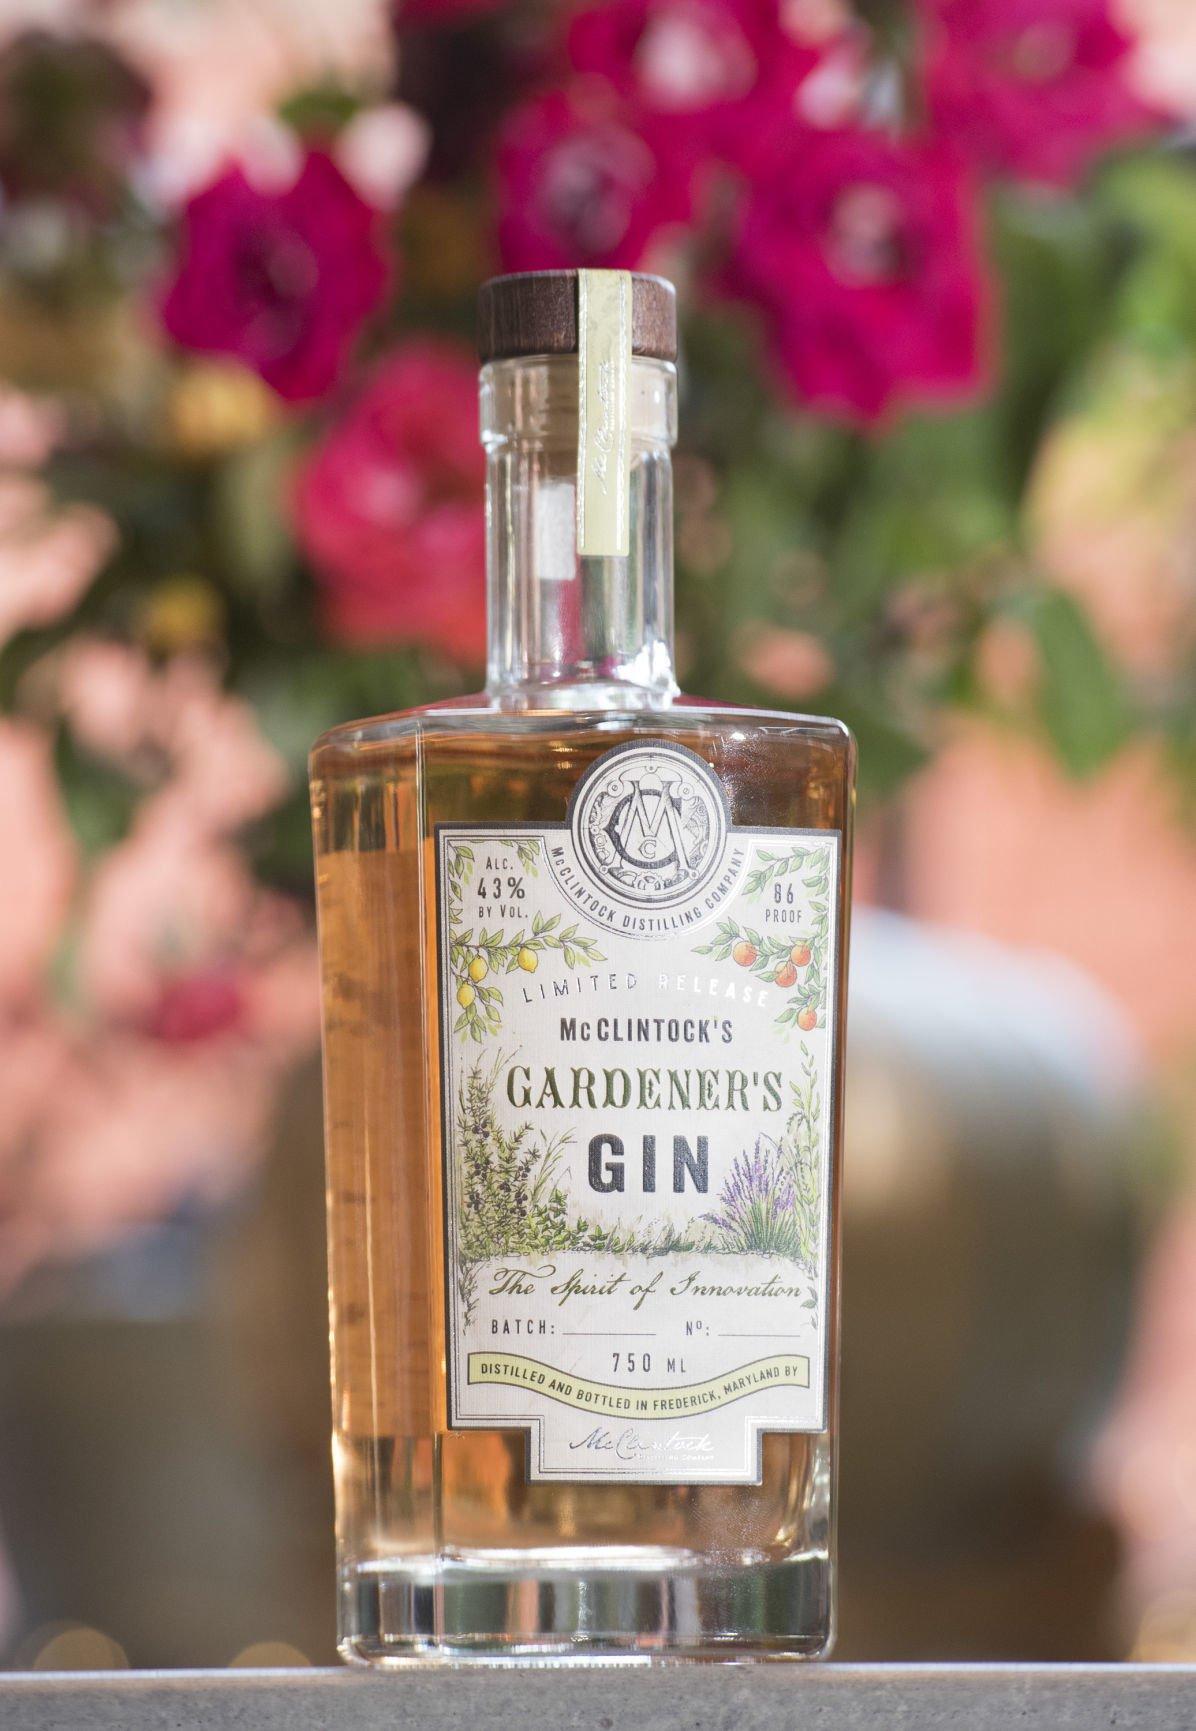 McClintock's Gardener's Gin